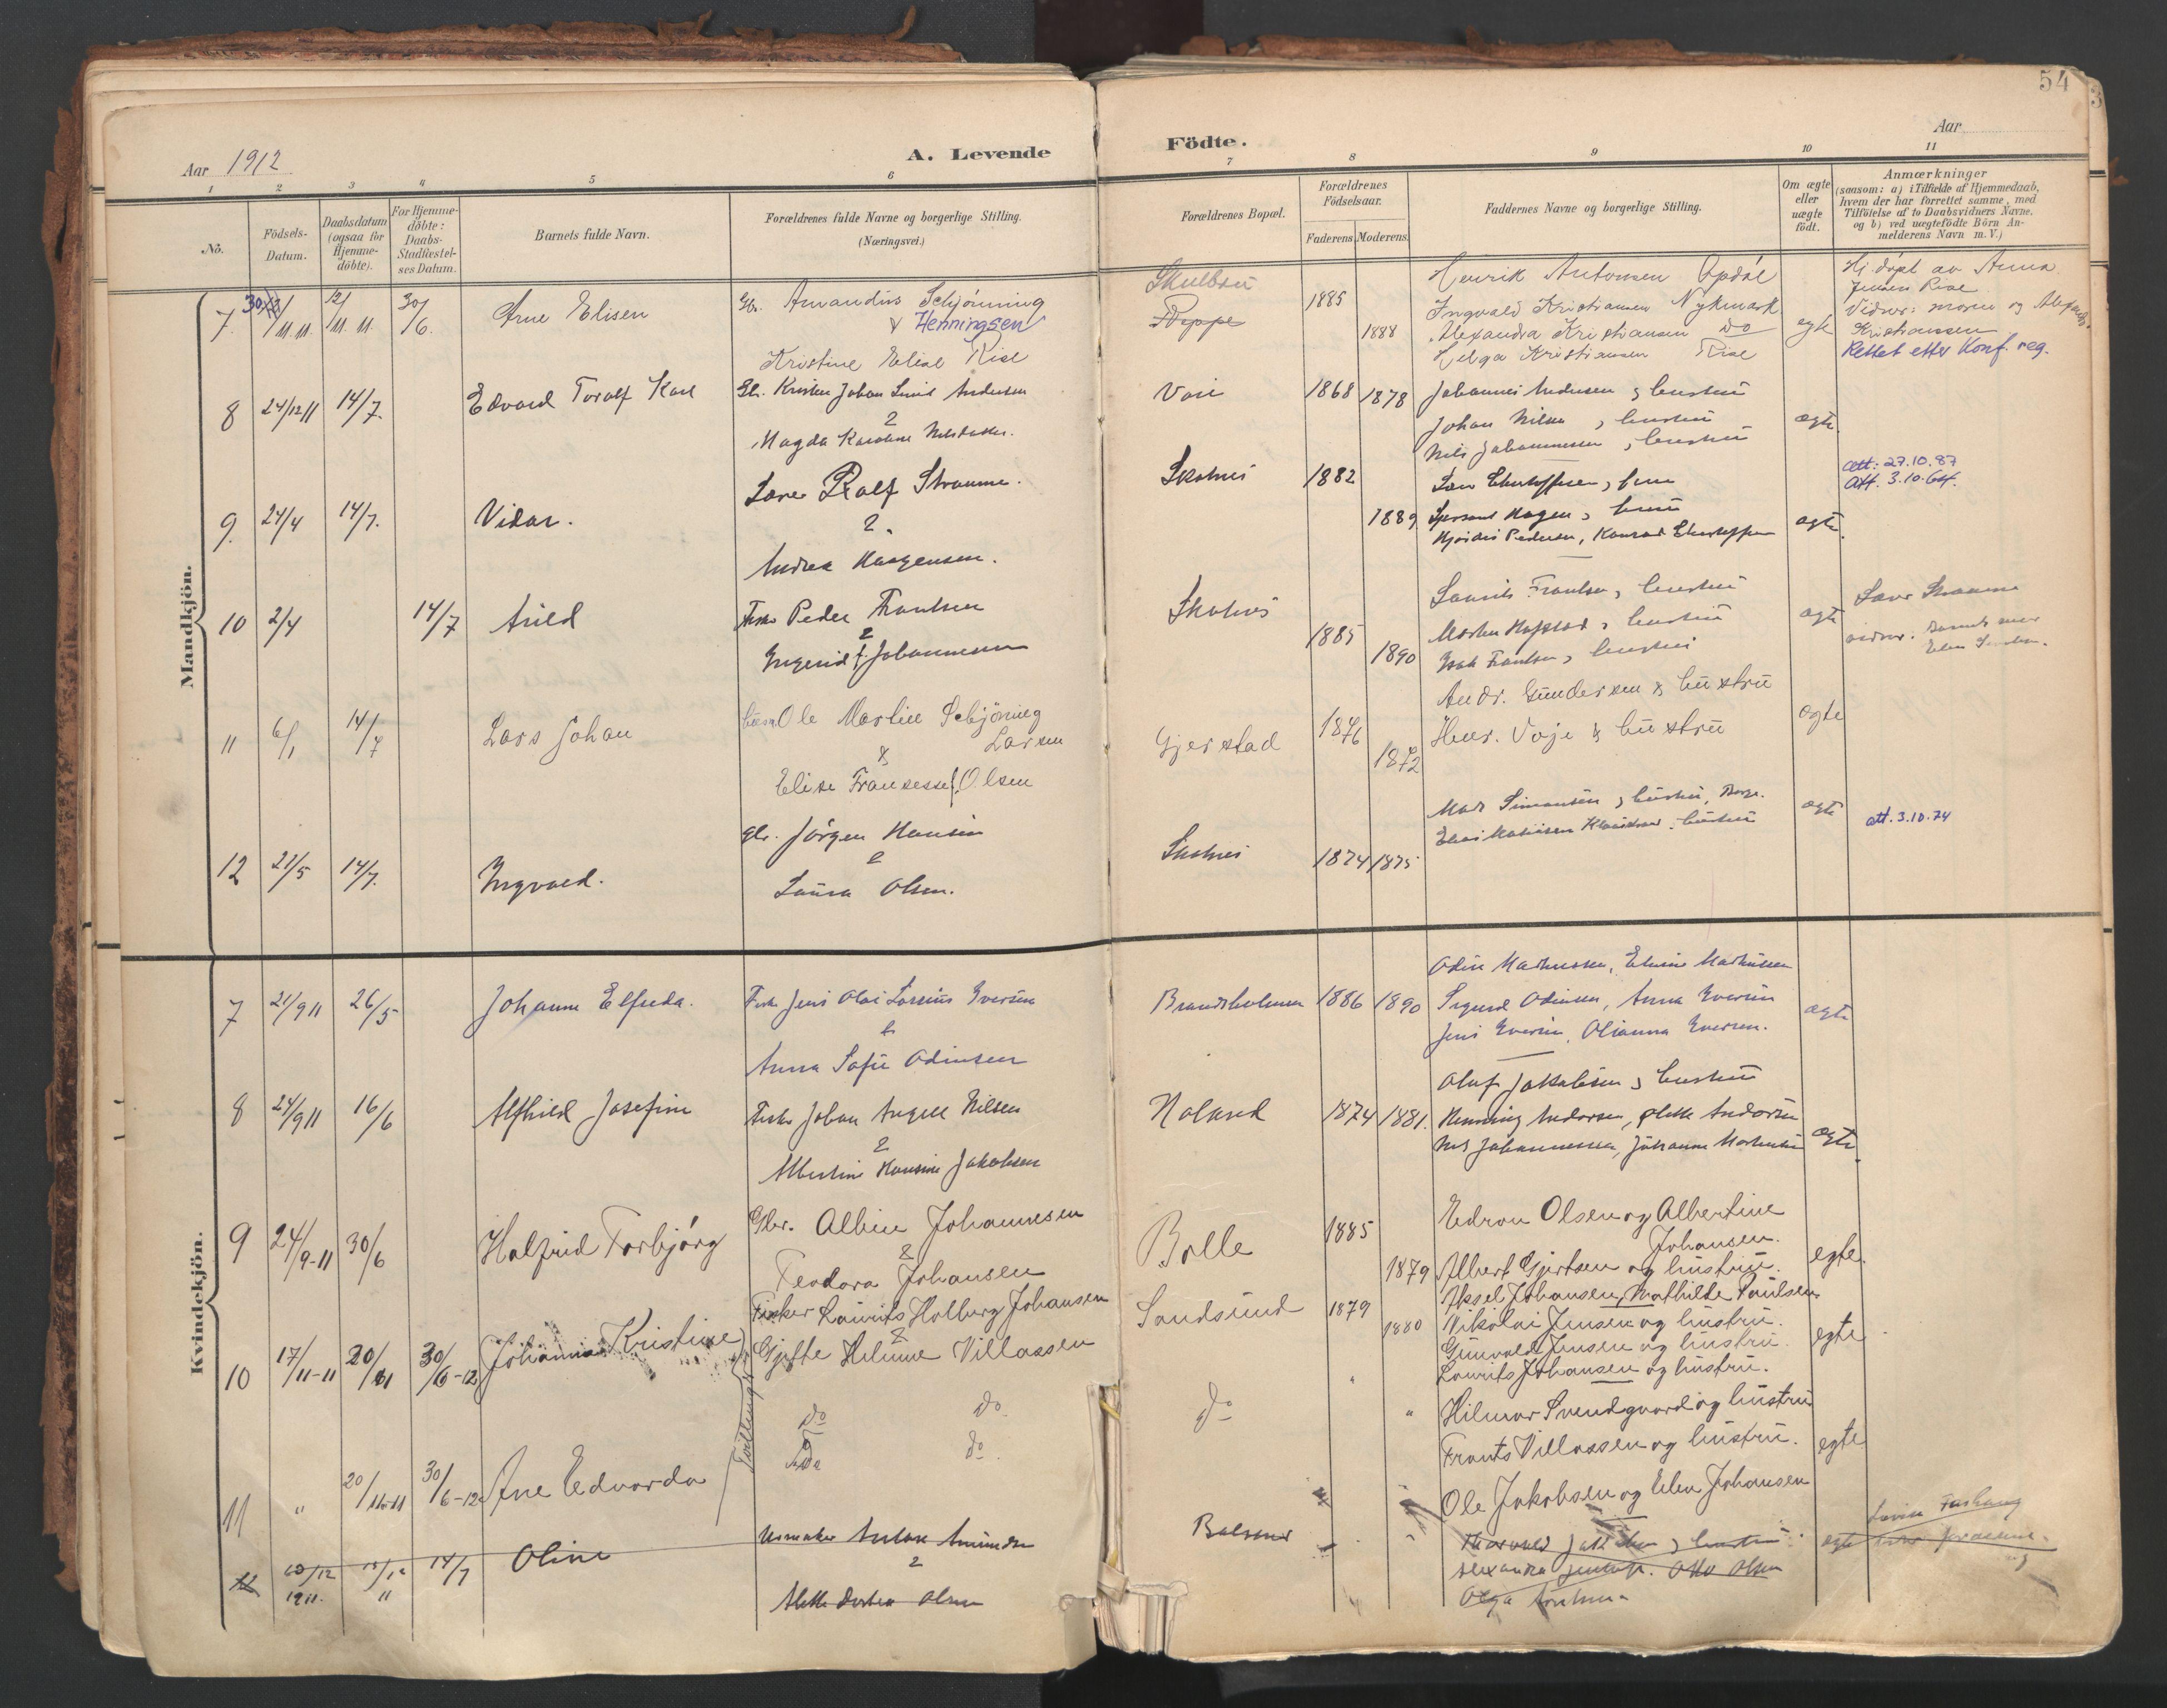 SAT, Ministerialprotokoller, klokkerbøker og fødselsregistre - Nordland, 881/L1154: Ministerialbok nr. 881A07, 1907-1918, s. 54